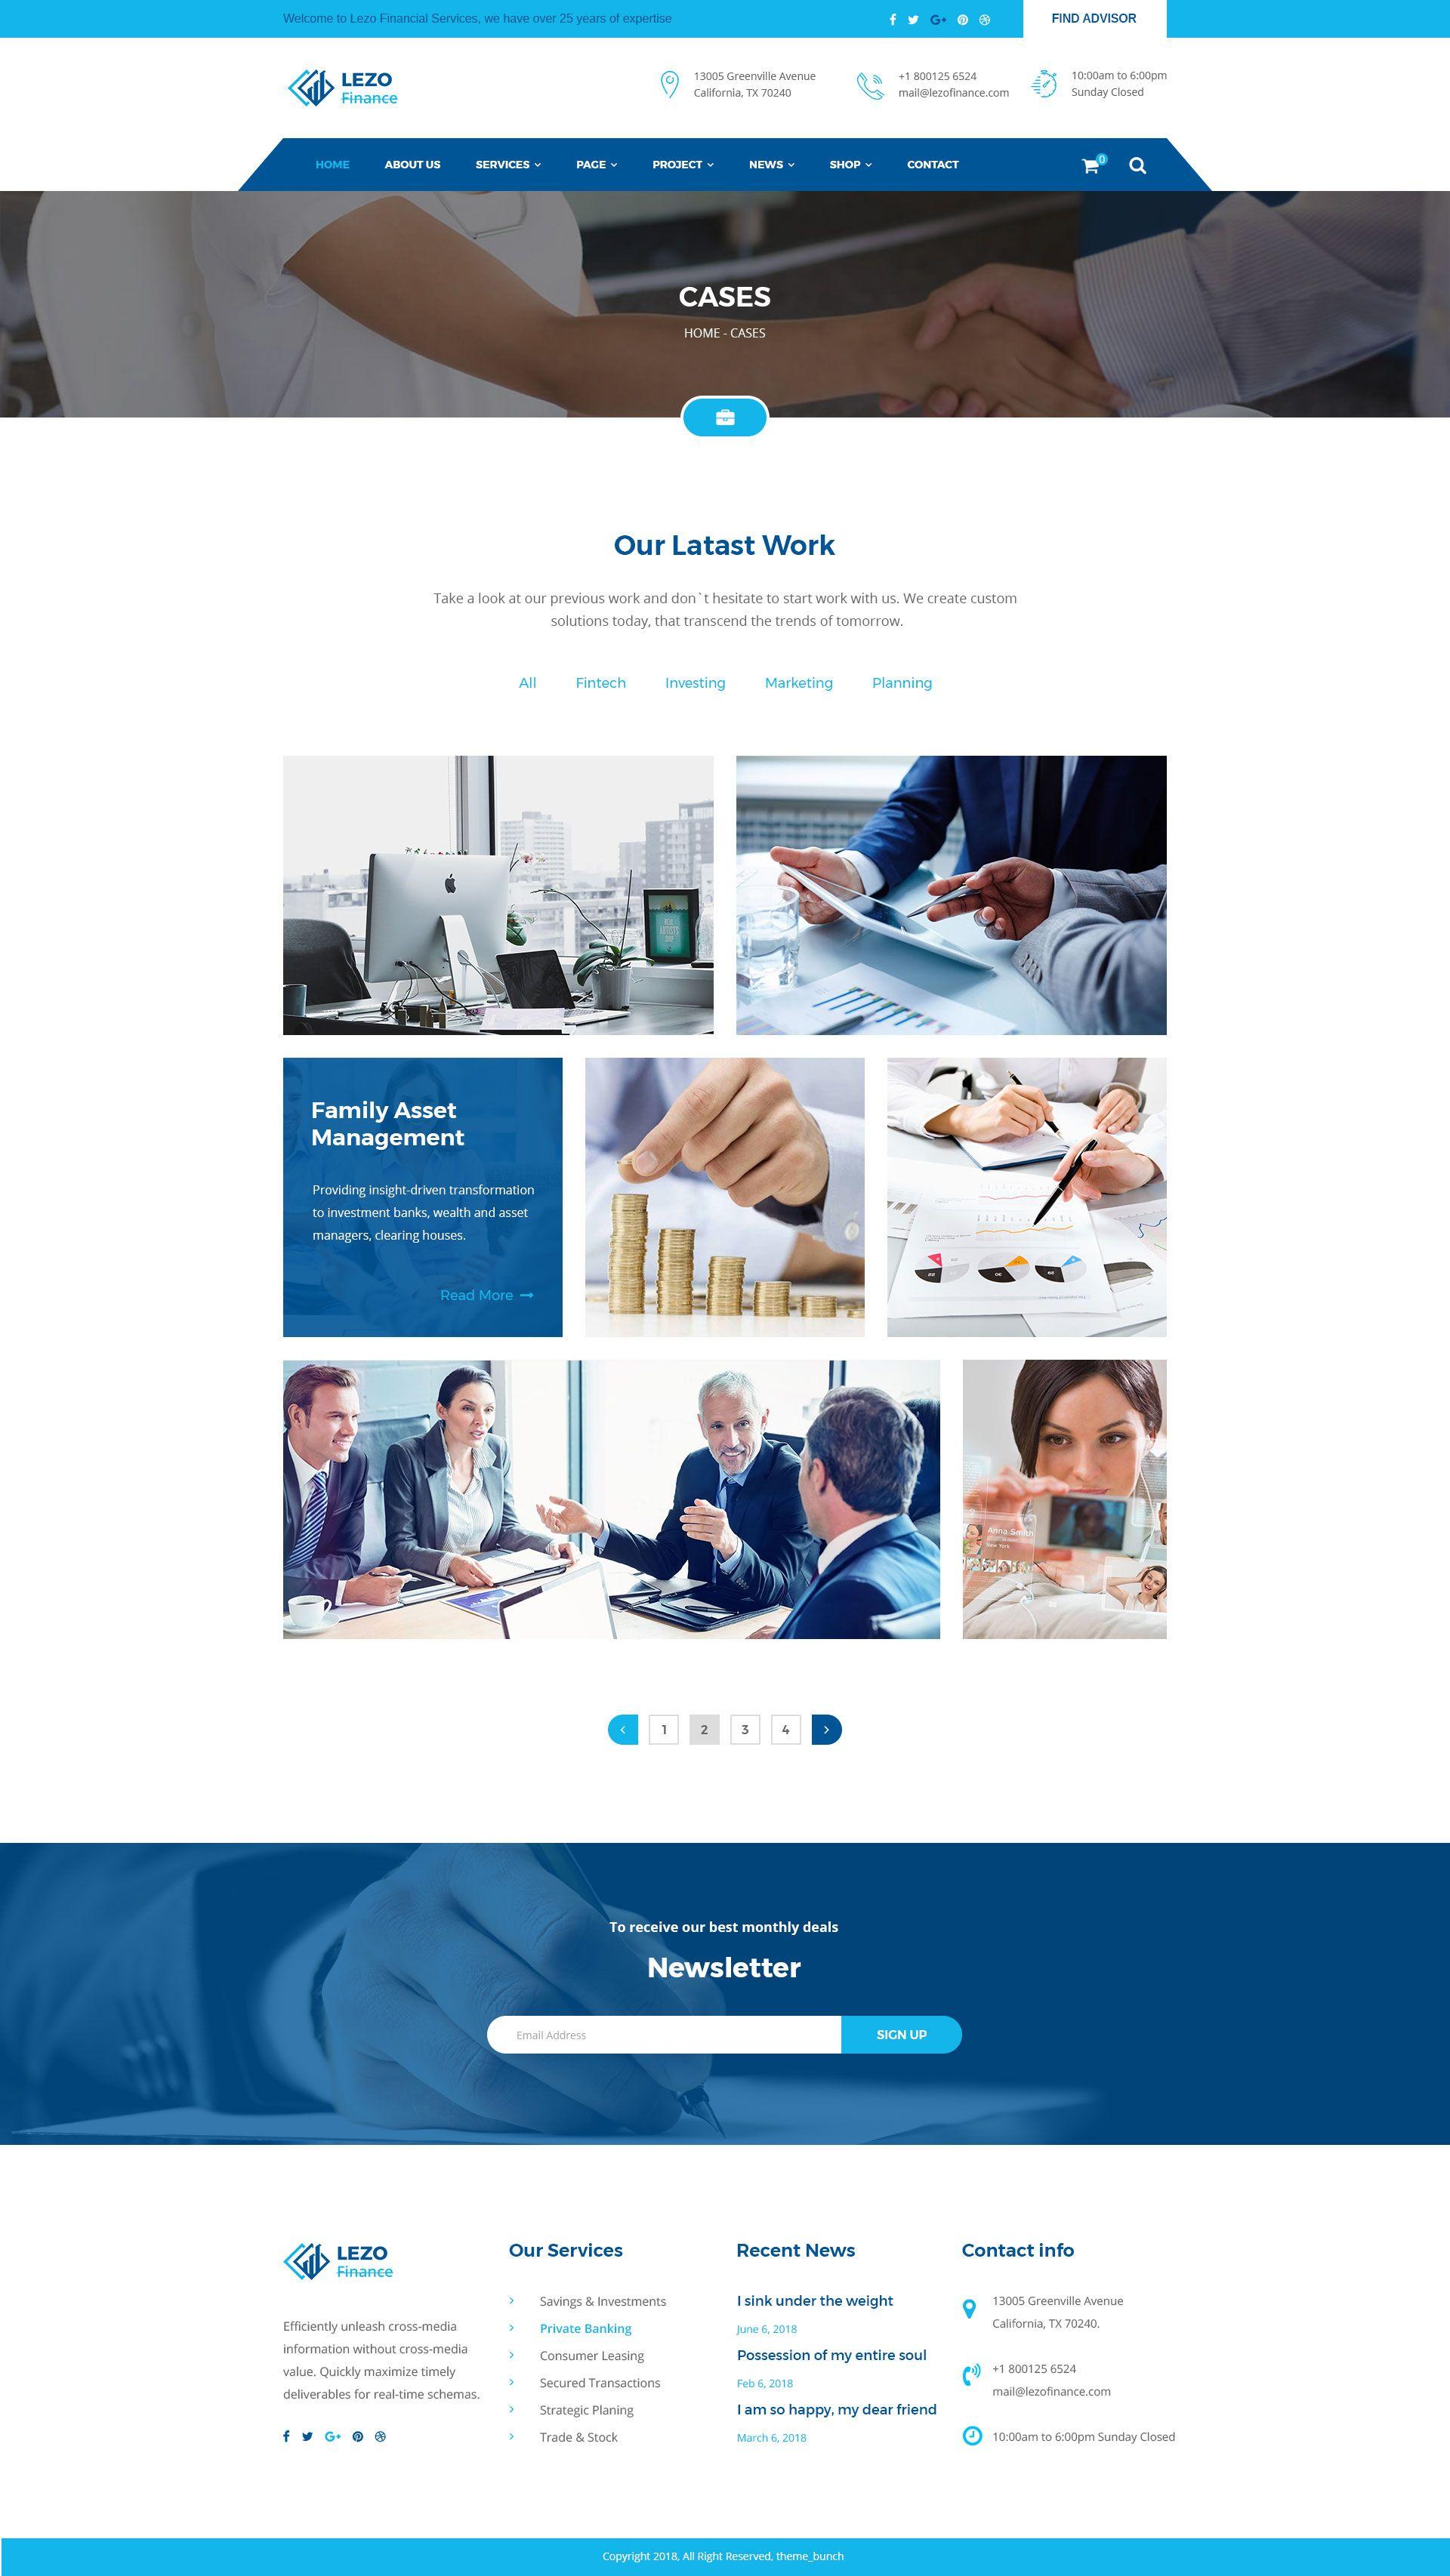 Lezo Business Finance Consulting Psd Template Finance Asset Management Psd Templates